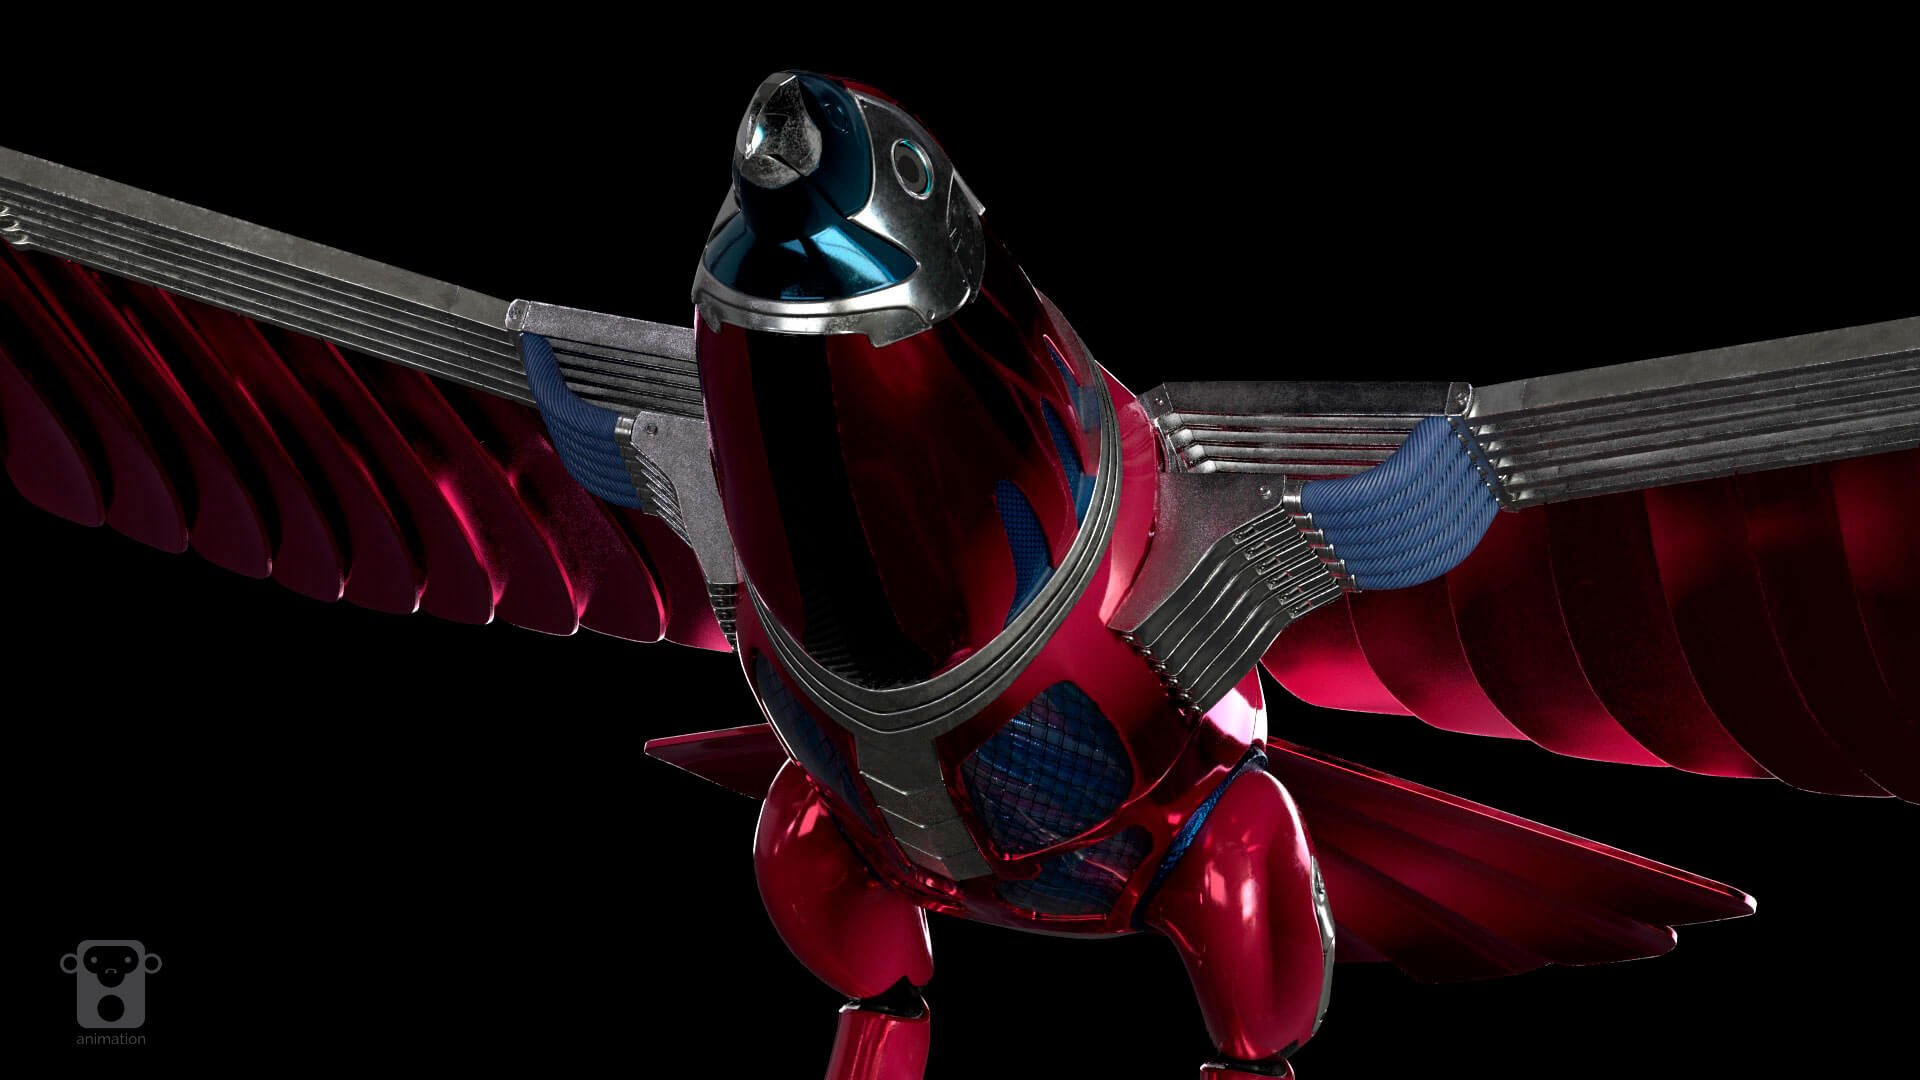 falcon-animacao-3d-personagem-animal-metal-ihara-impulsa-1-1920x1080